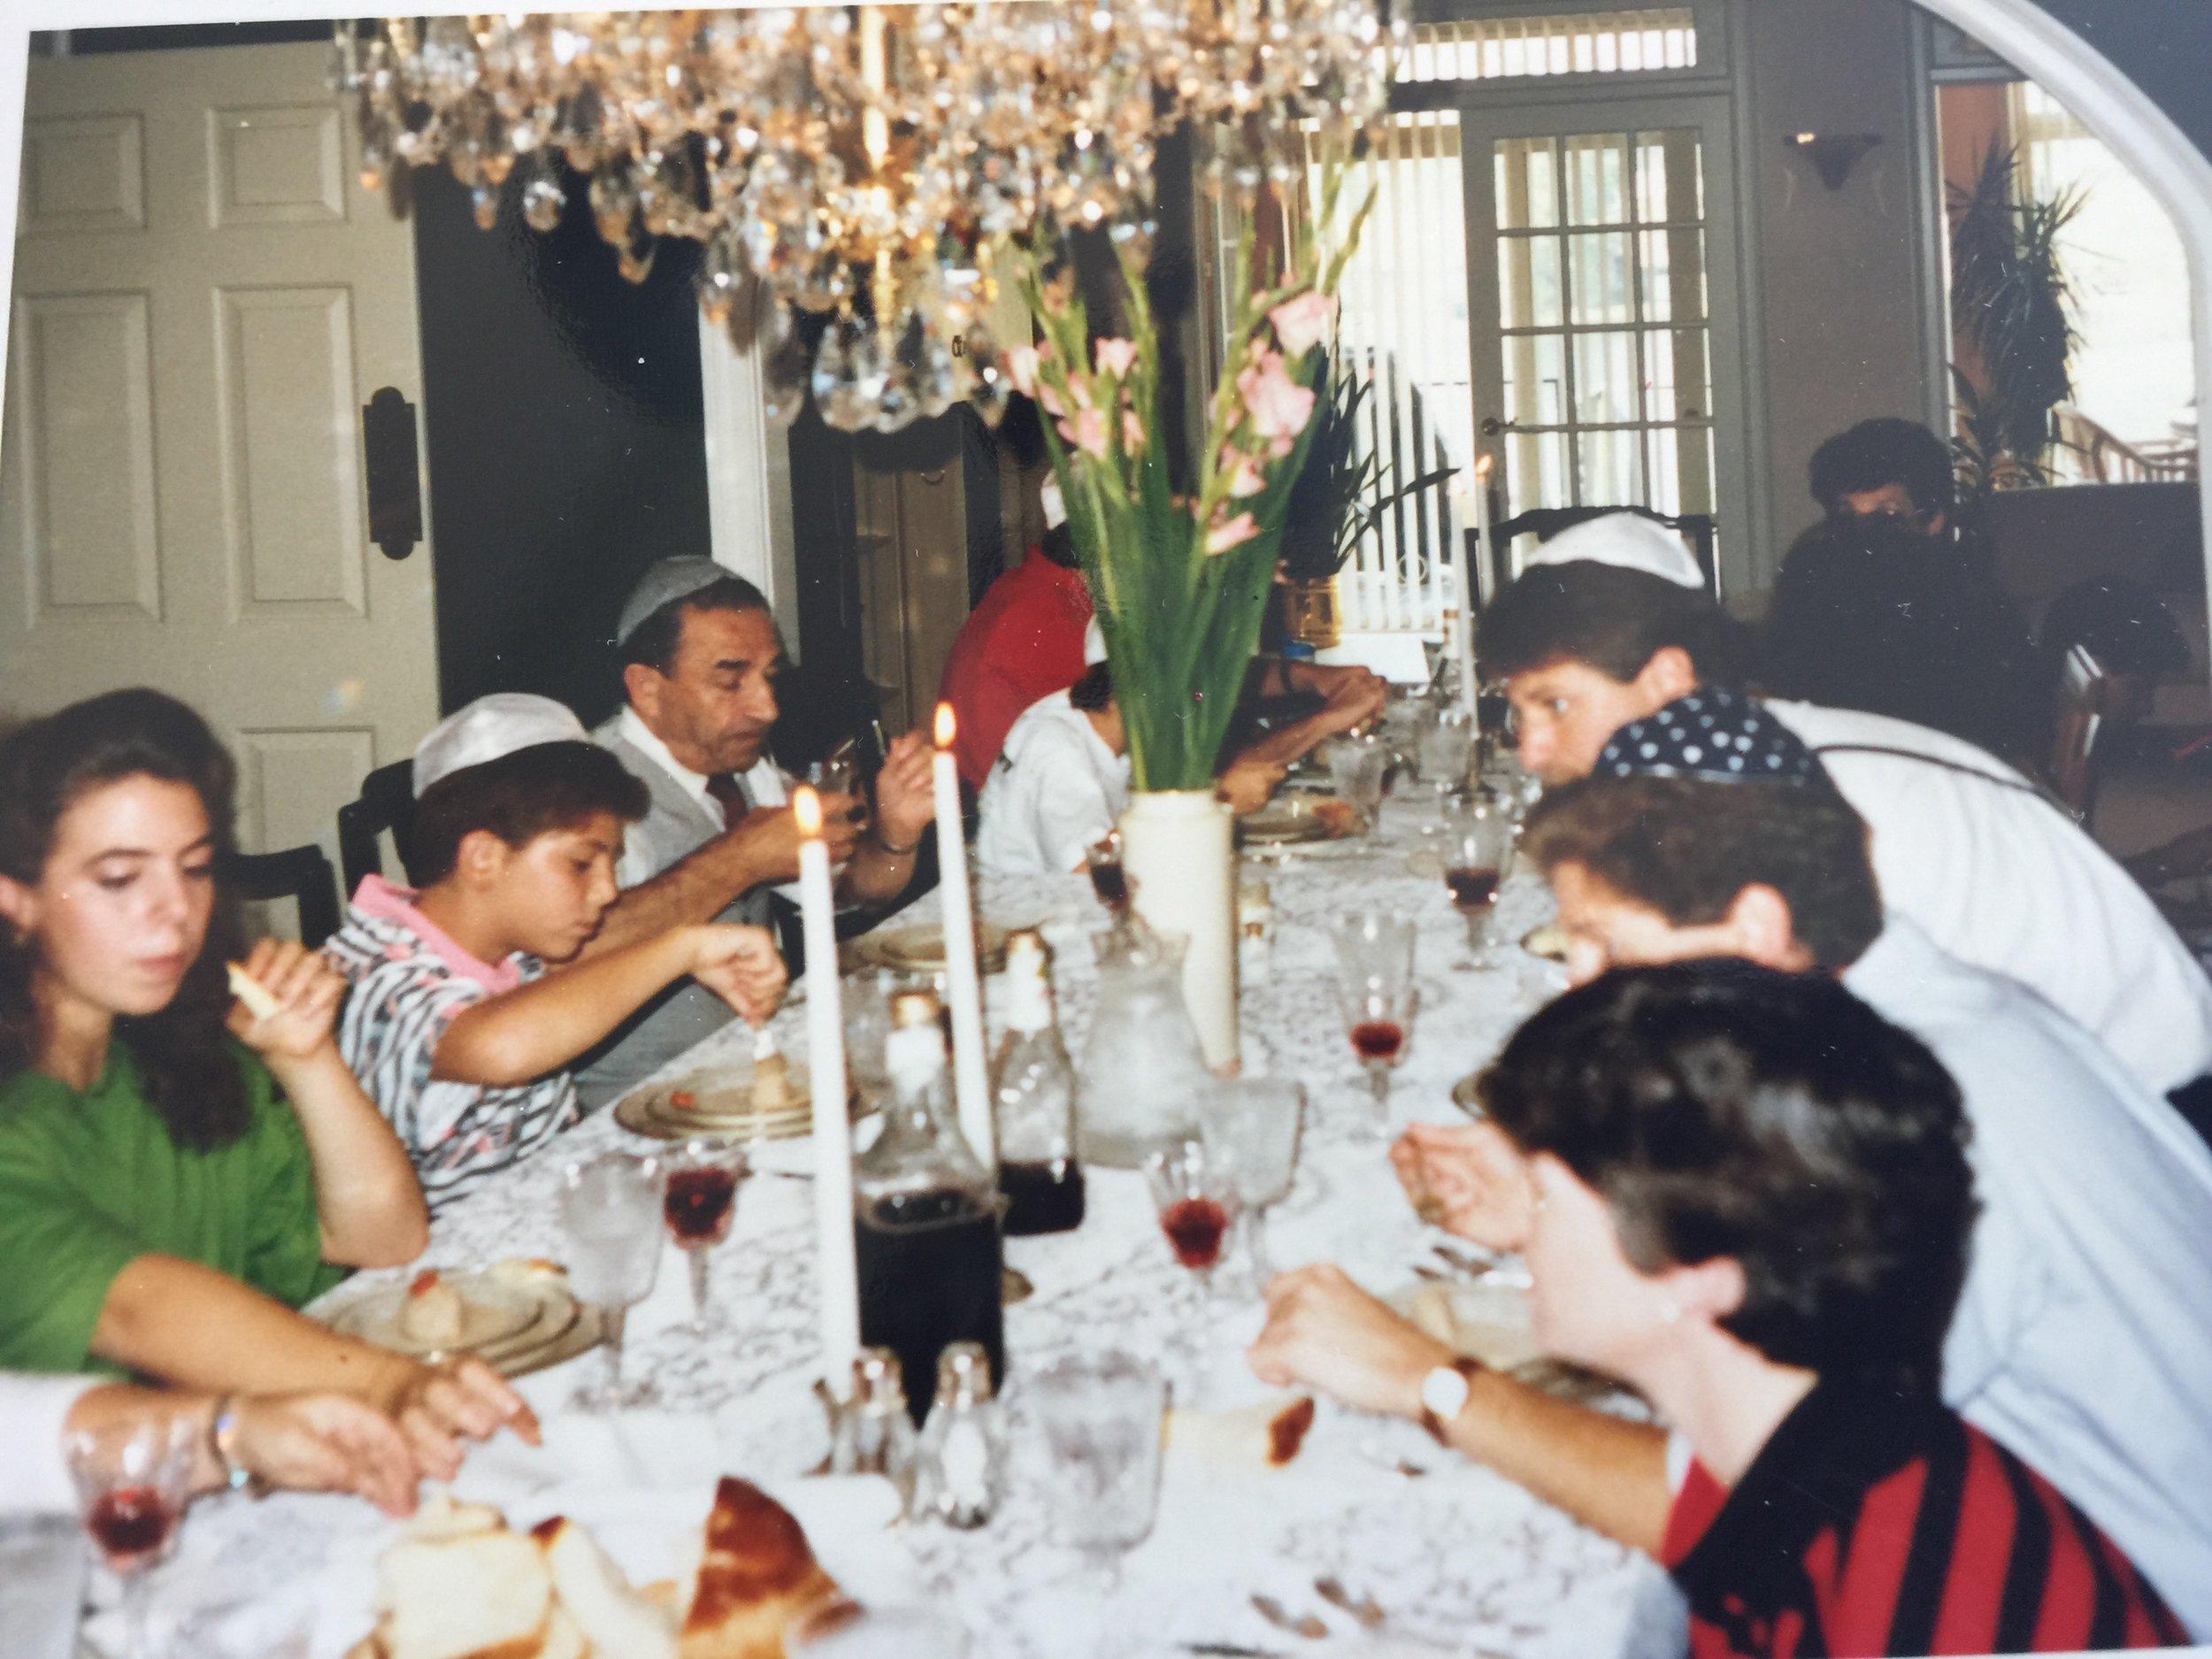 Rosh Hashanah in Filler home, 1988. Image courtesy of Lilly Stern Filler.